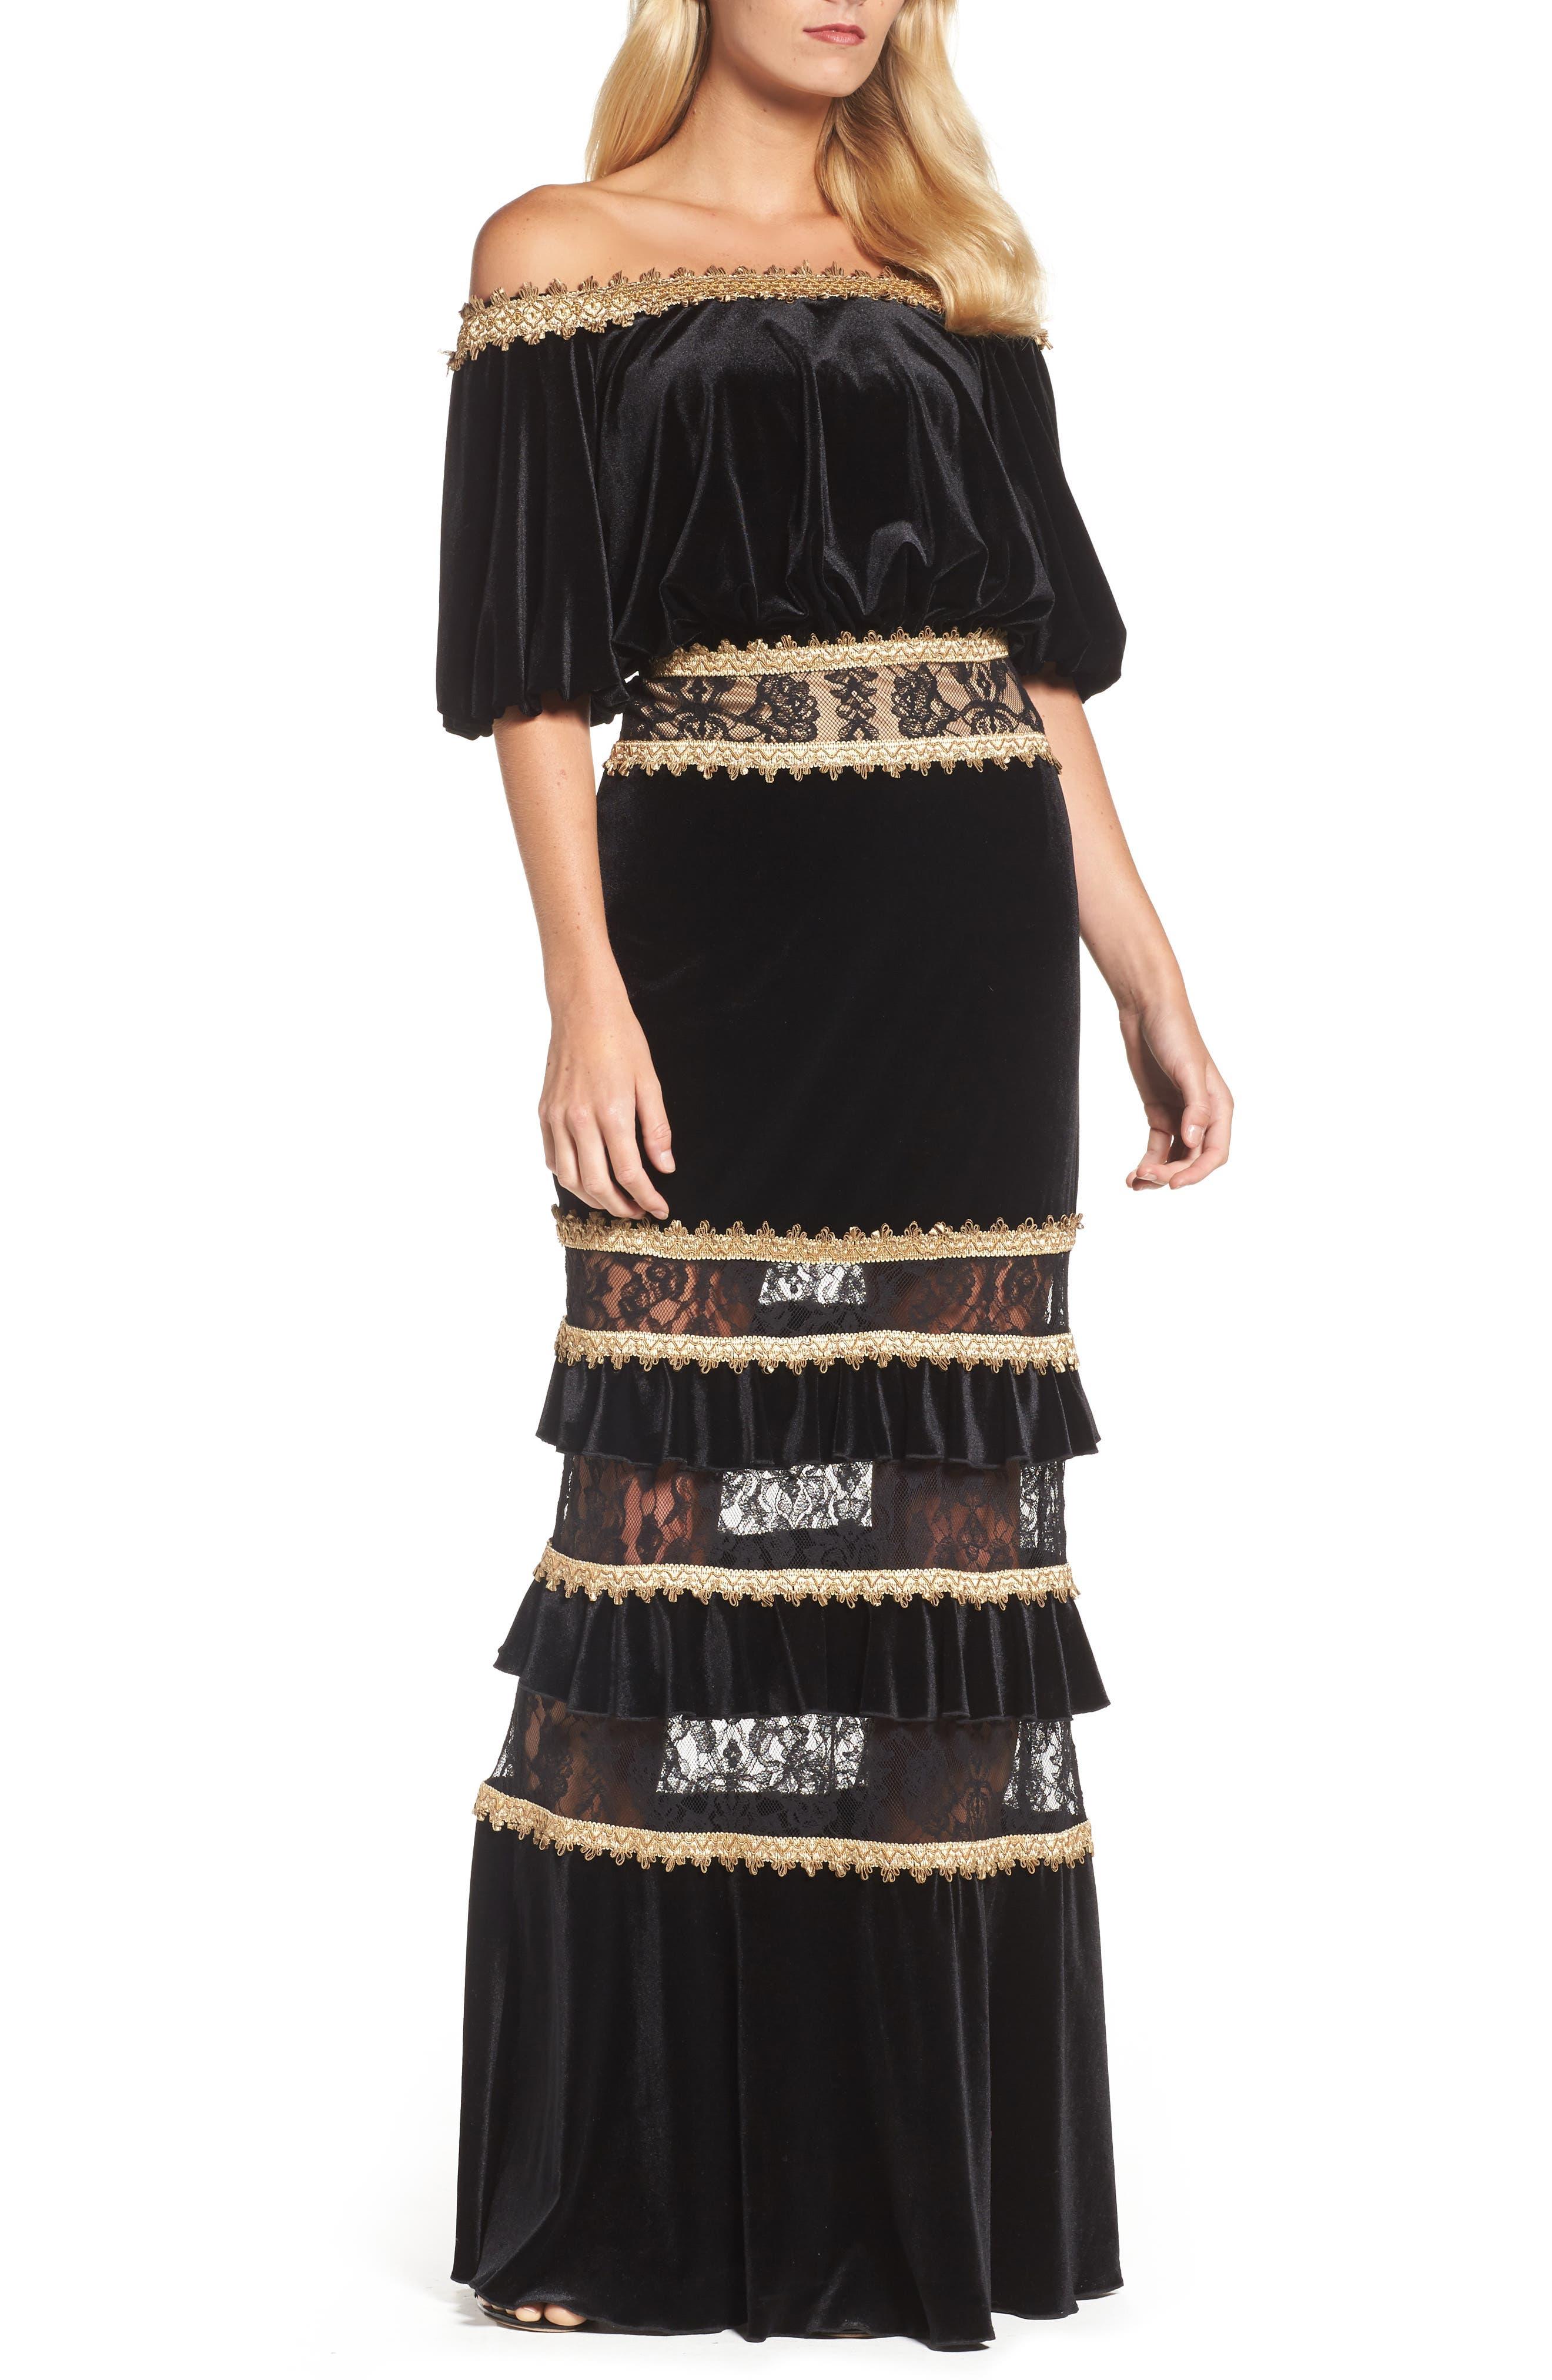 Main Image - Tadashi Shoji Velvet Ruffle & Lace Off the Shoulder Gown